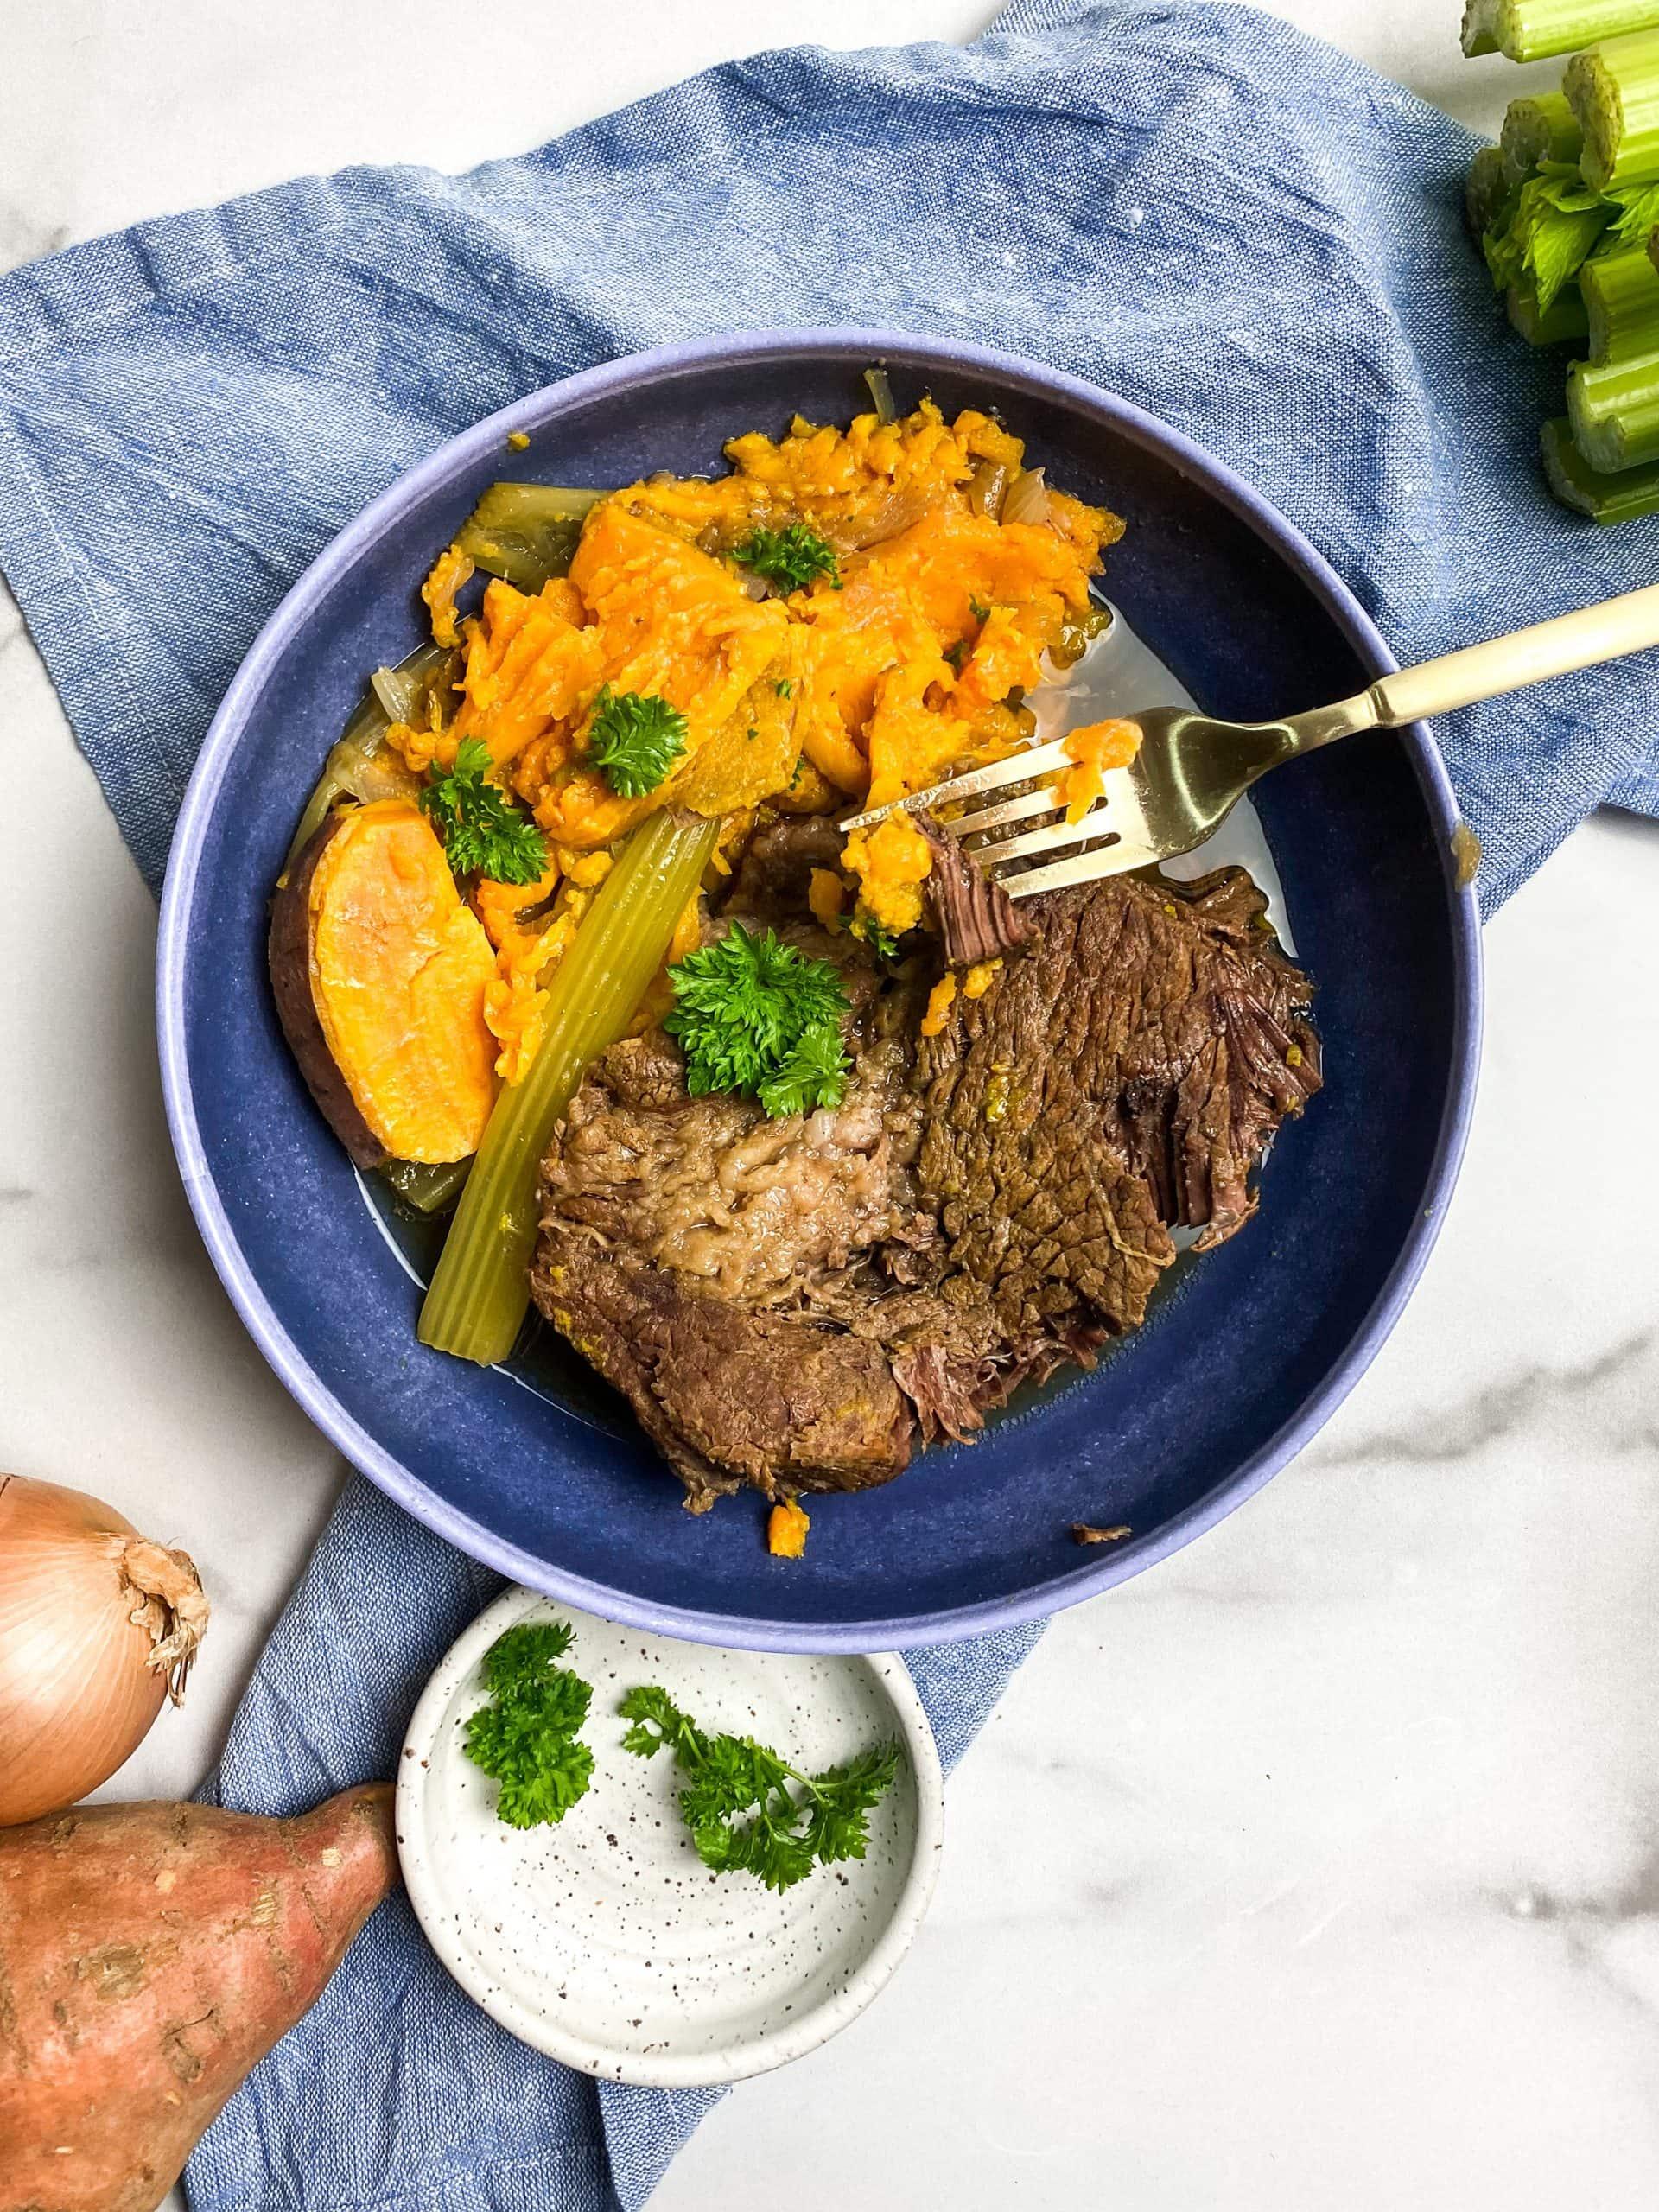 chuck roast and pot roast vegetables